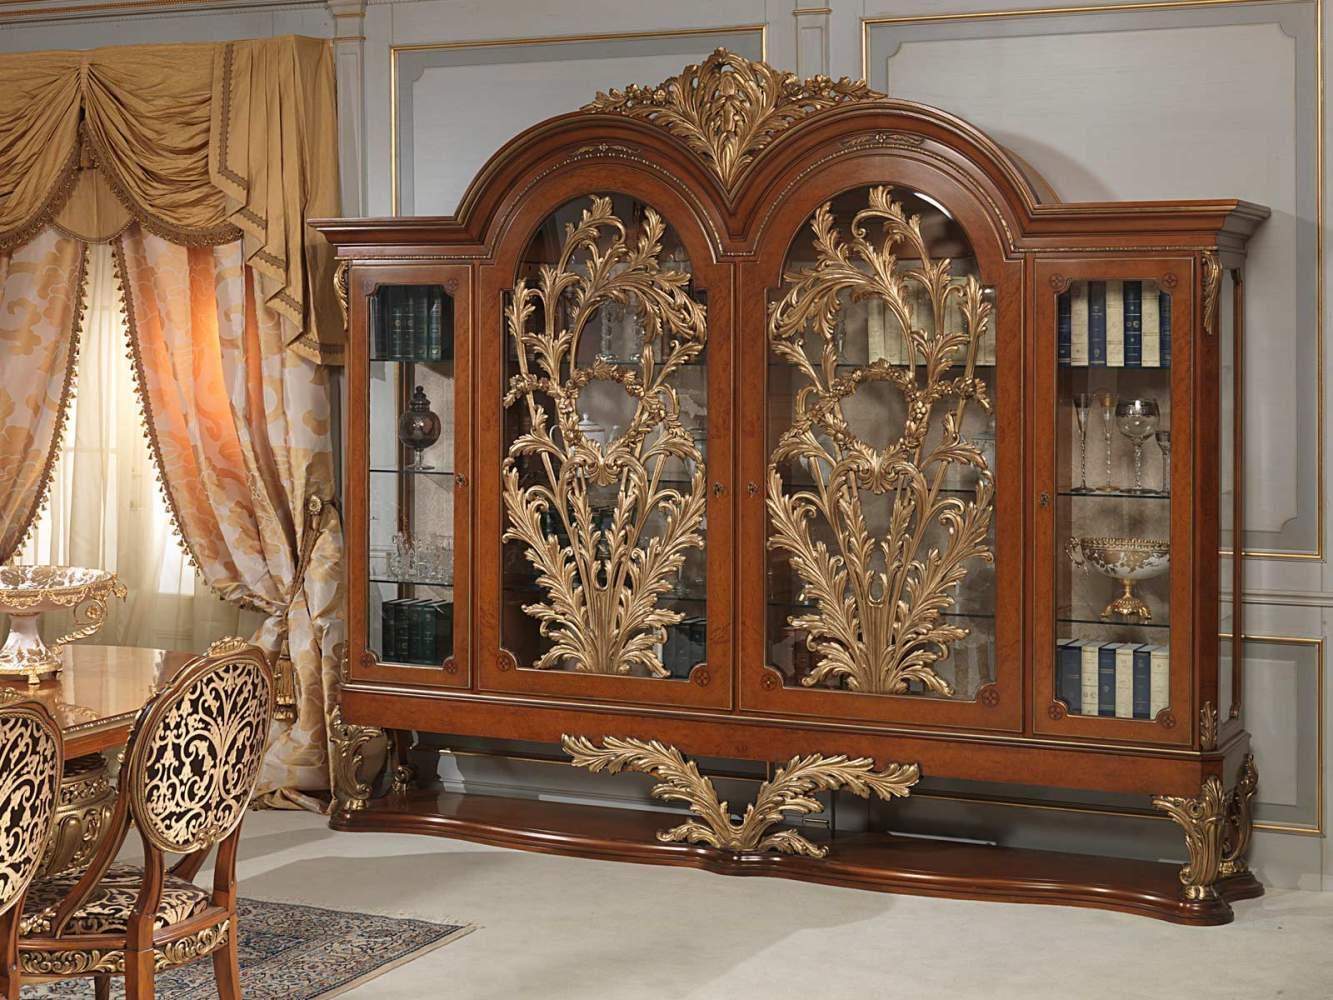 Versailles glass showcase in Louis XVI style